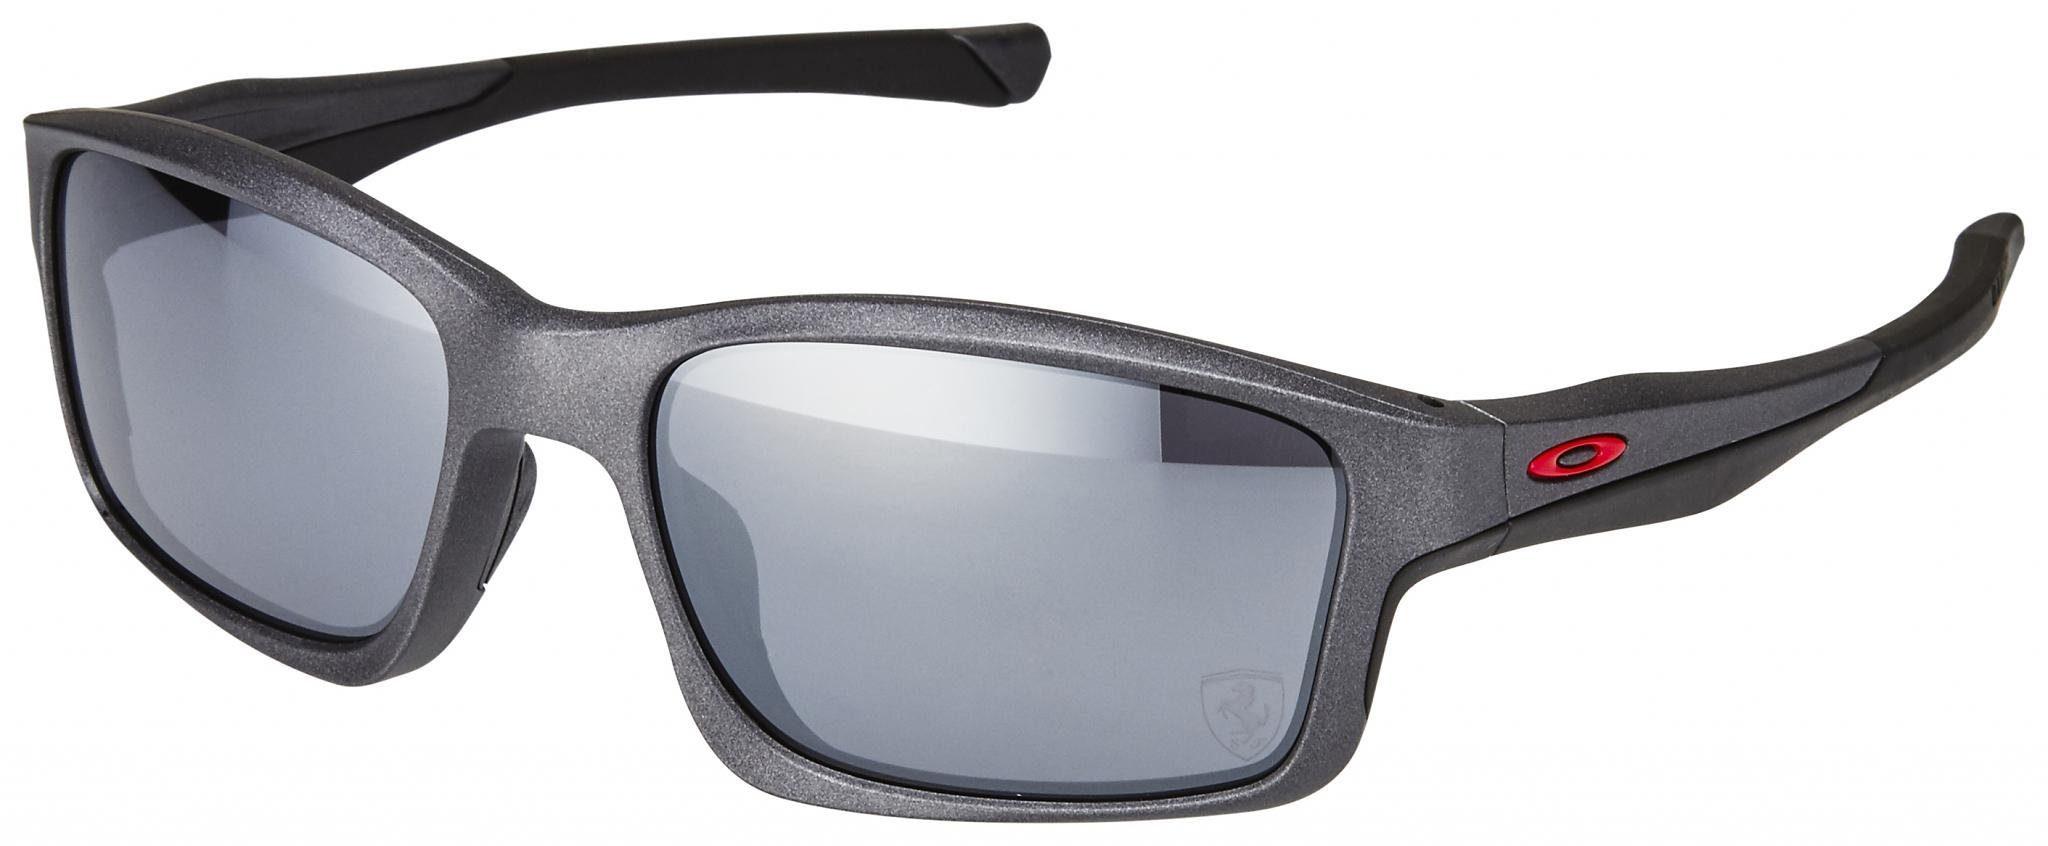 Oakley Radsportbrille »Chainlink Scuderia Ferrari«